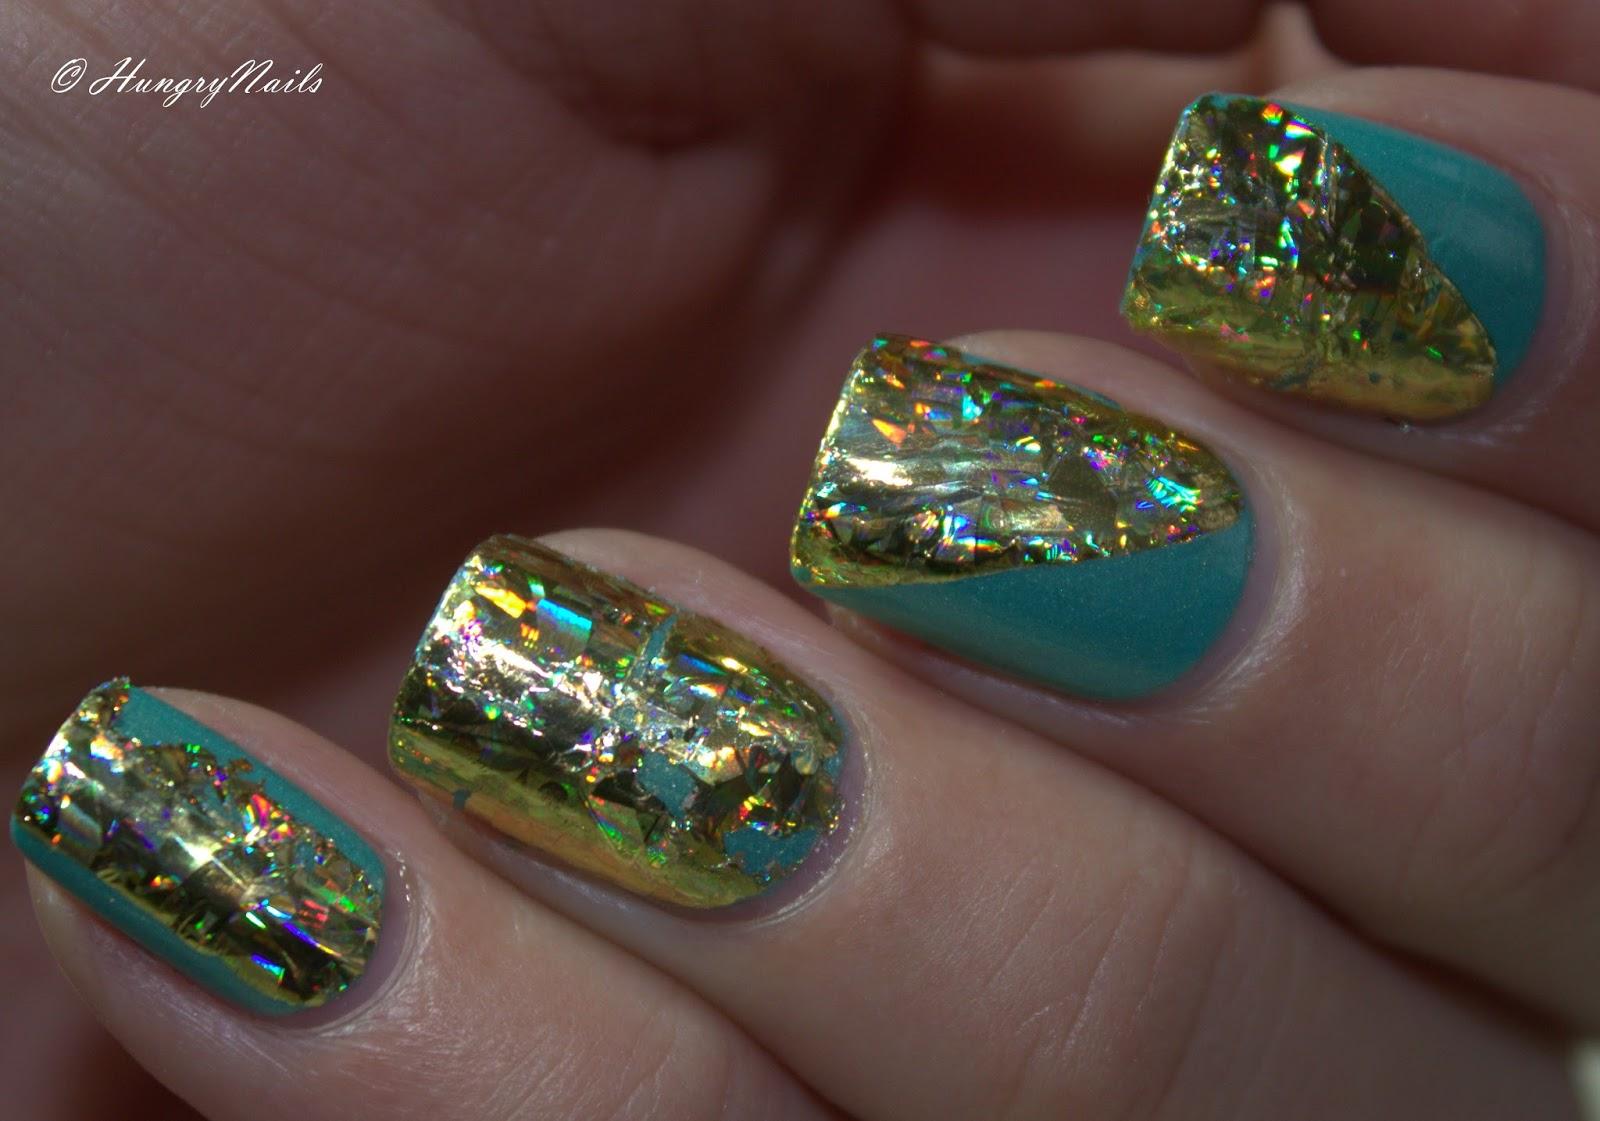 Nail Art | Transfer Folien Design - HungryNails Blog | Die bunte ...